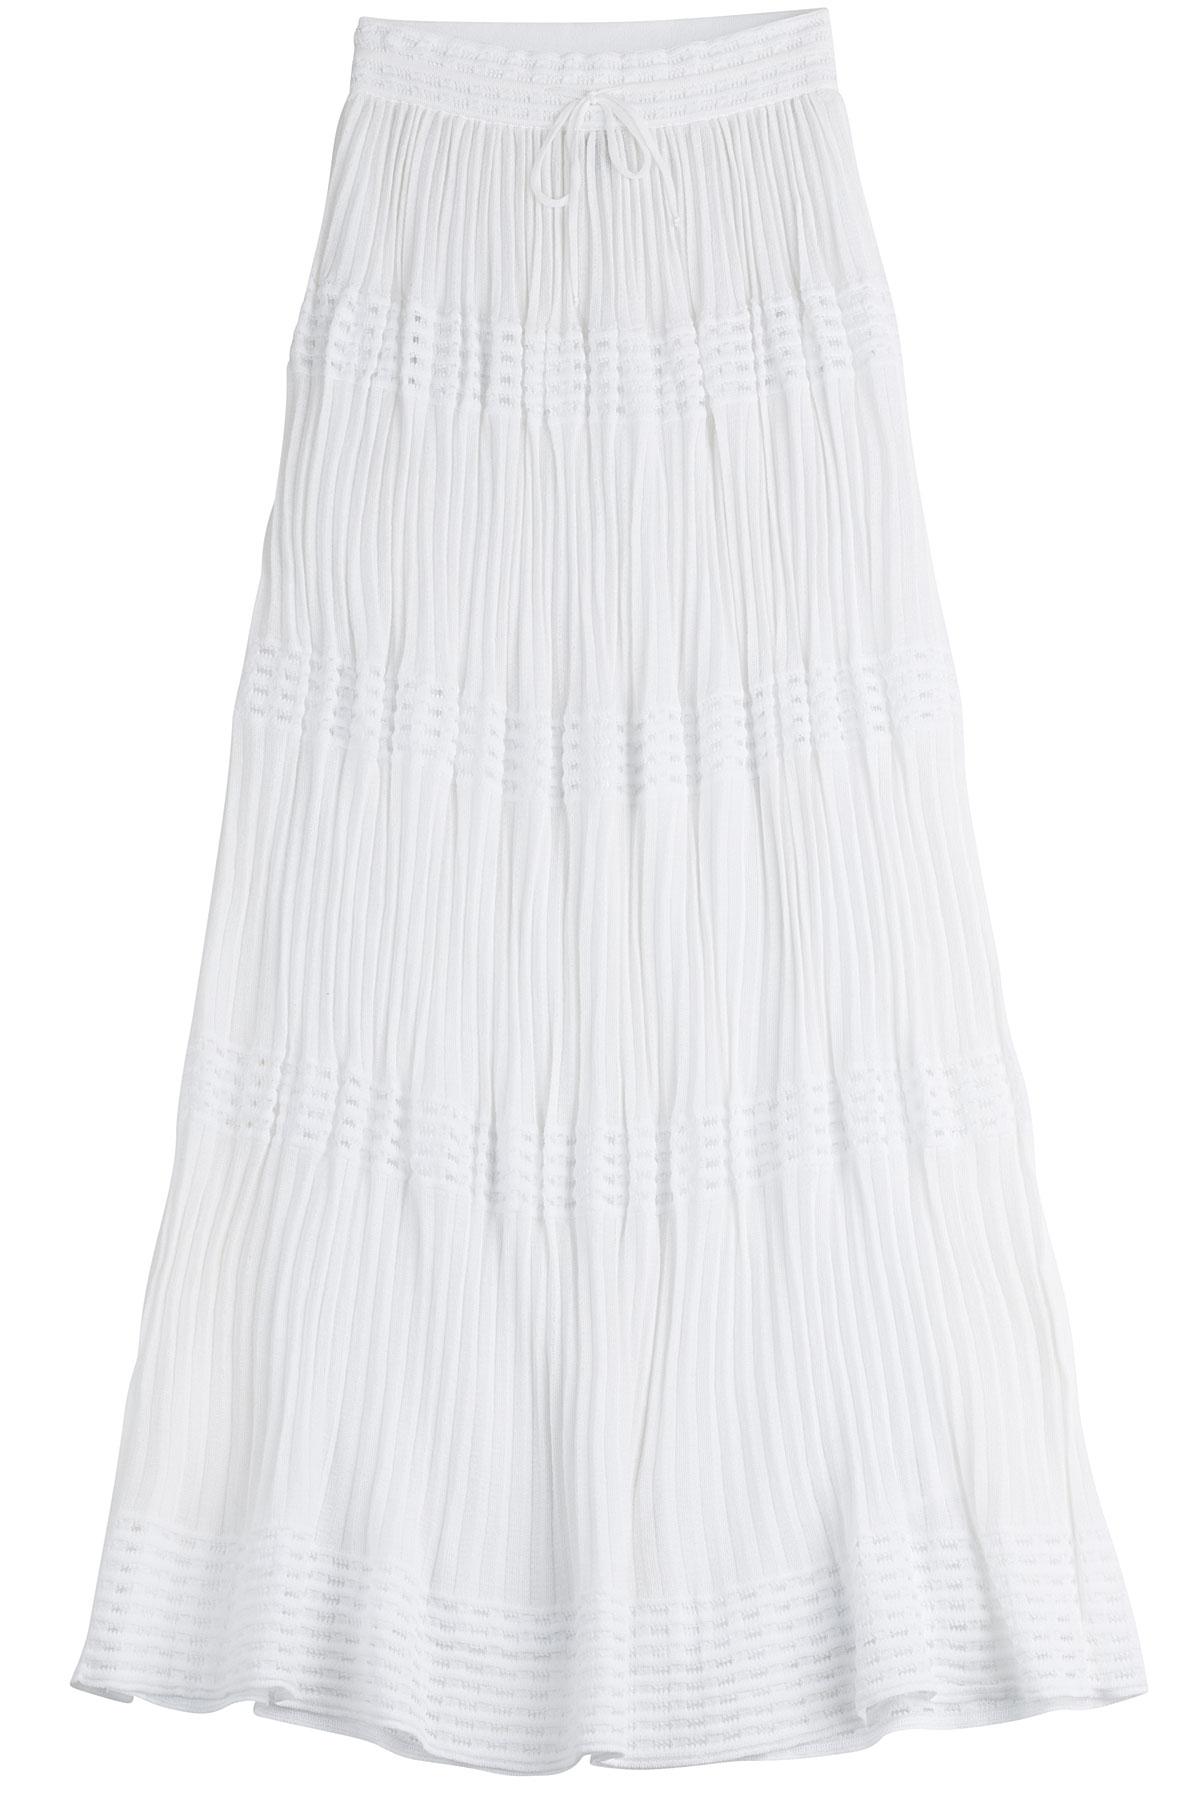 m missoni cotton maxi skirt white in white lyst